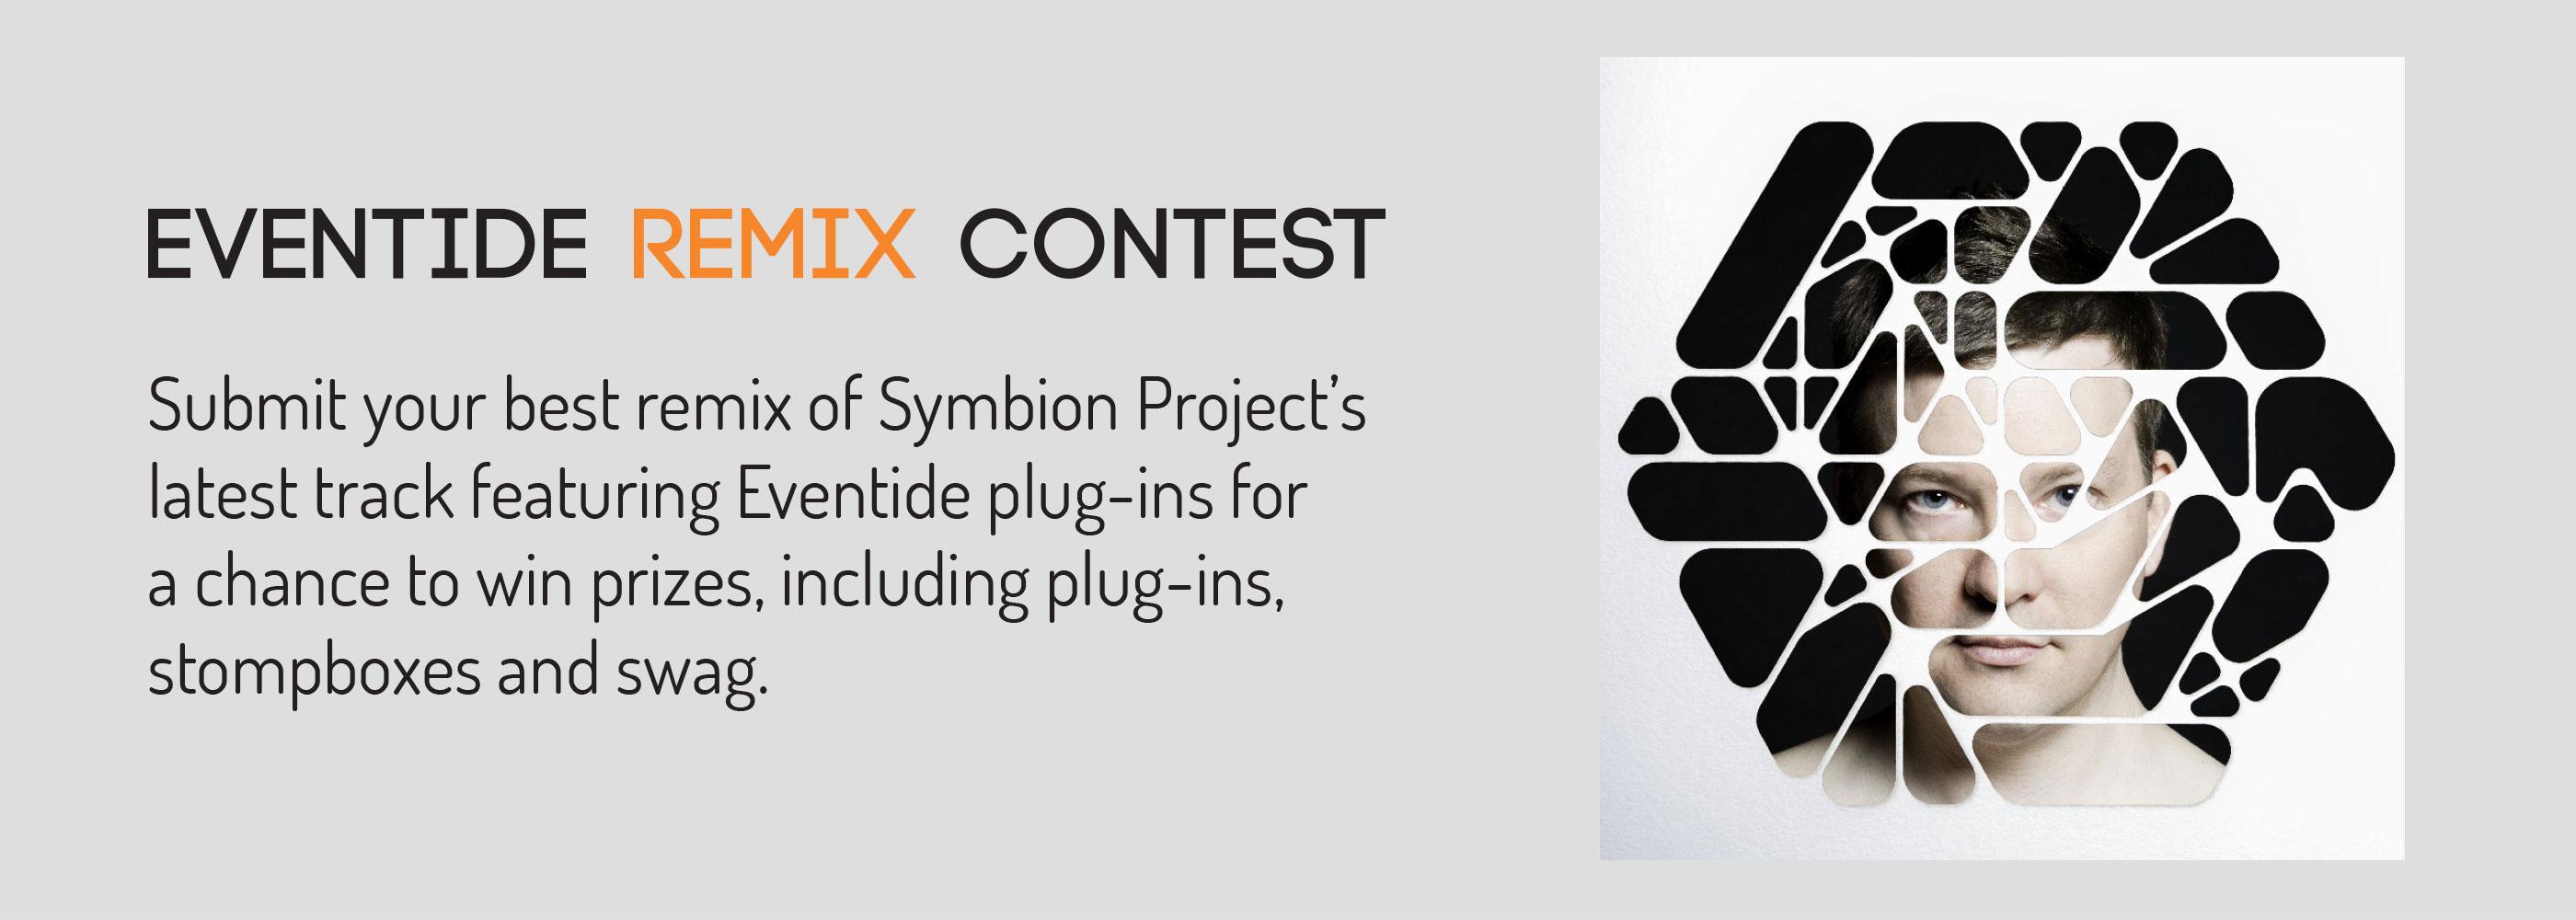 Eventide Remix Contest